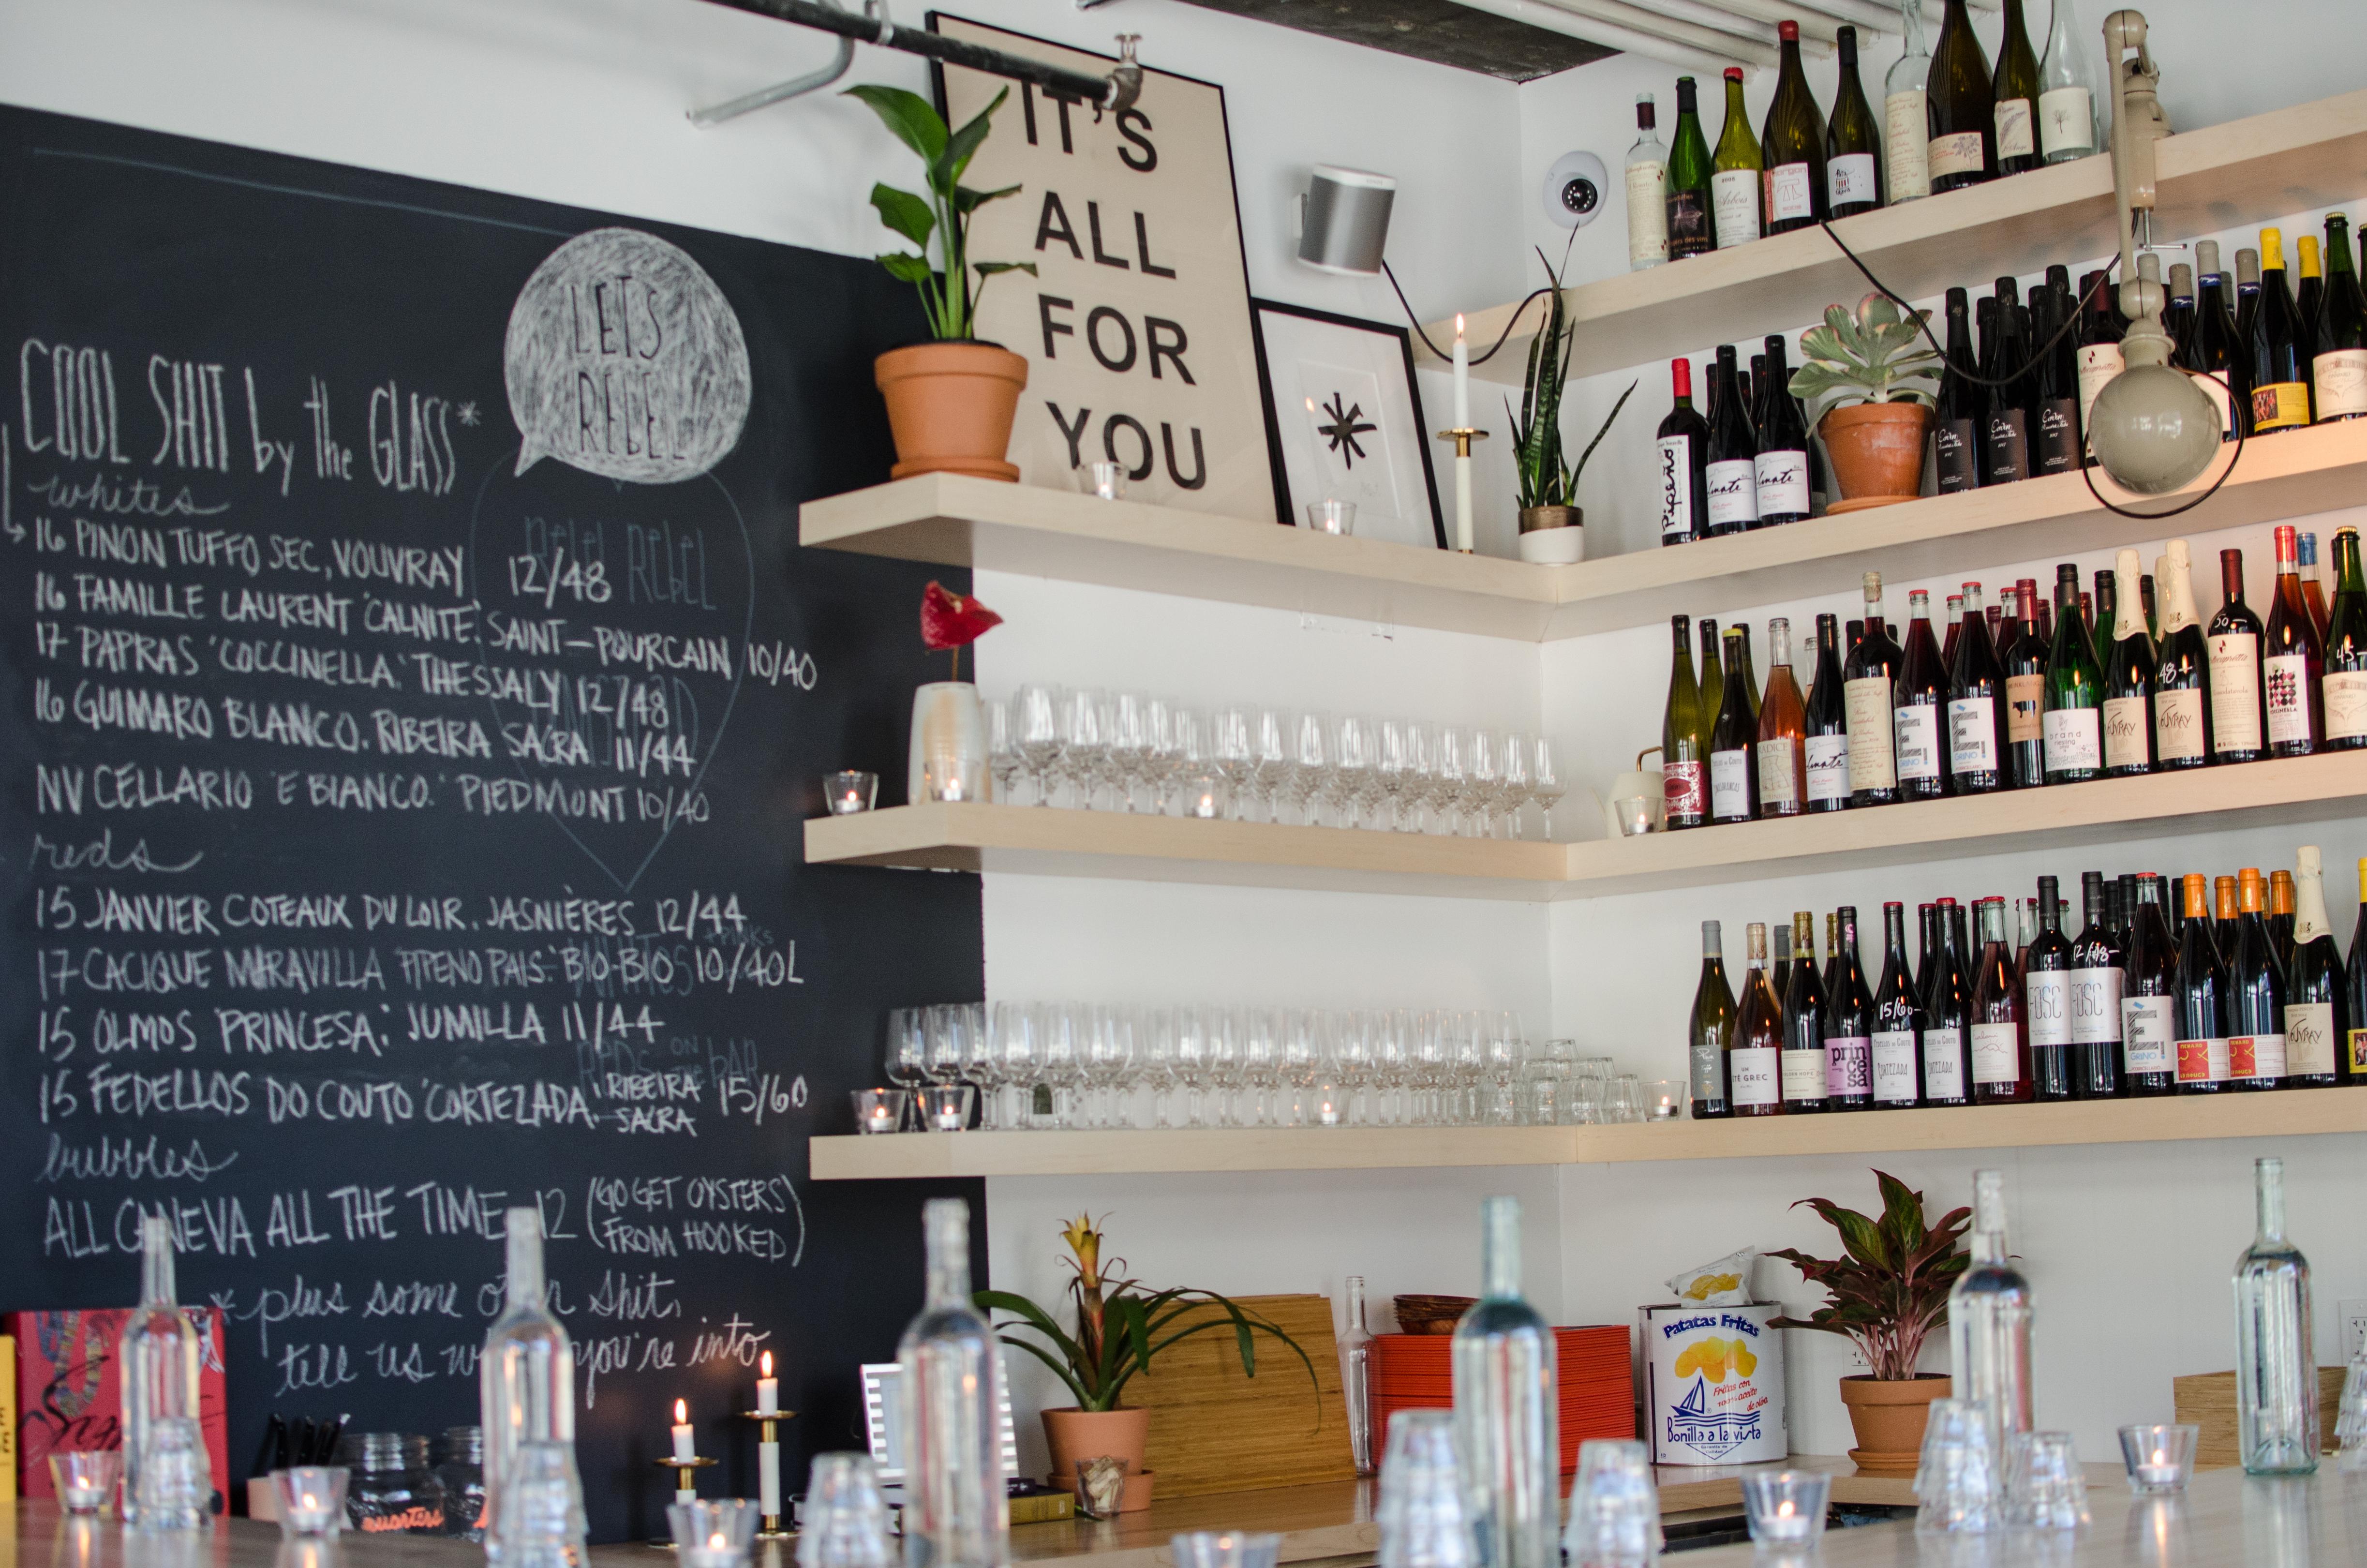 Shelves of wine bottles and a chalkboard menu inside a wine bar